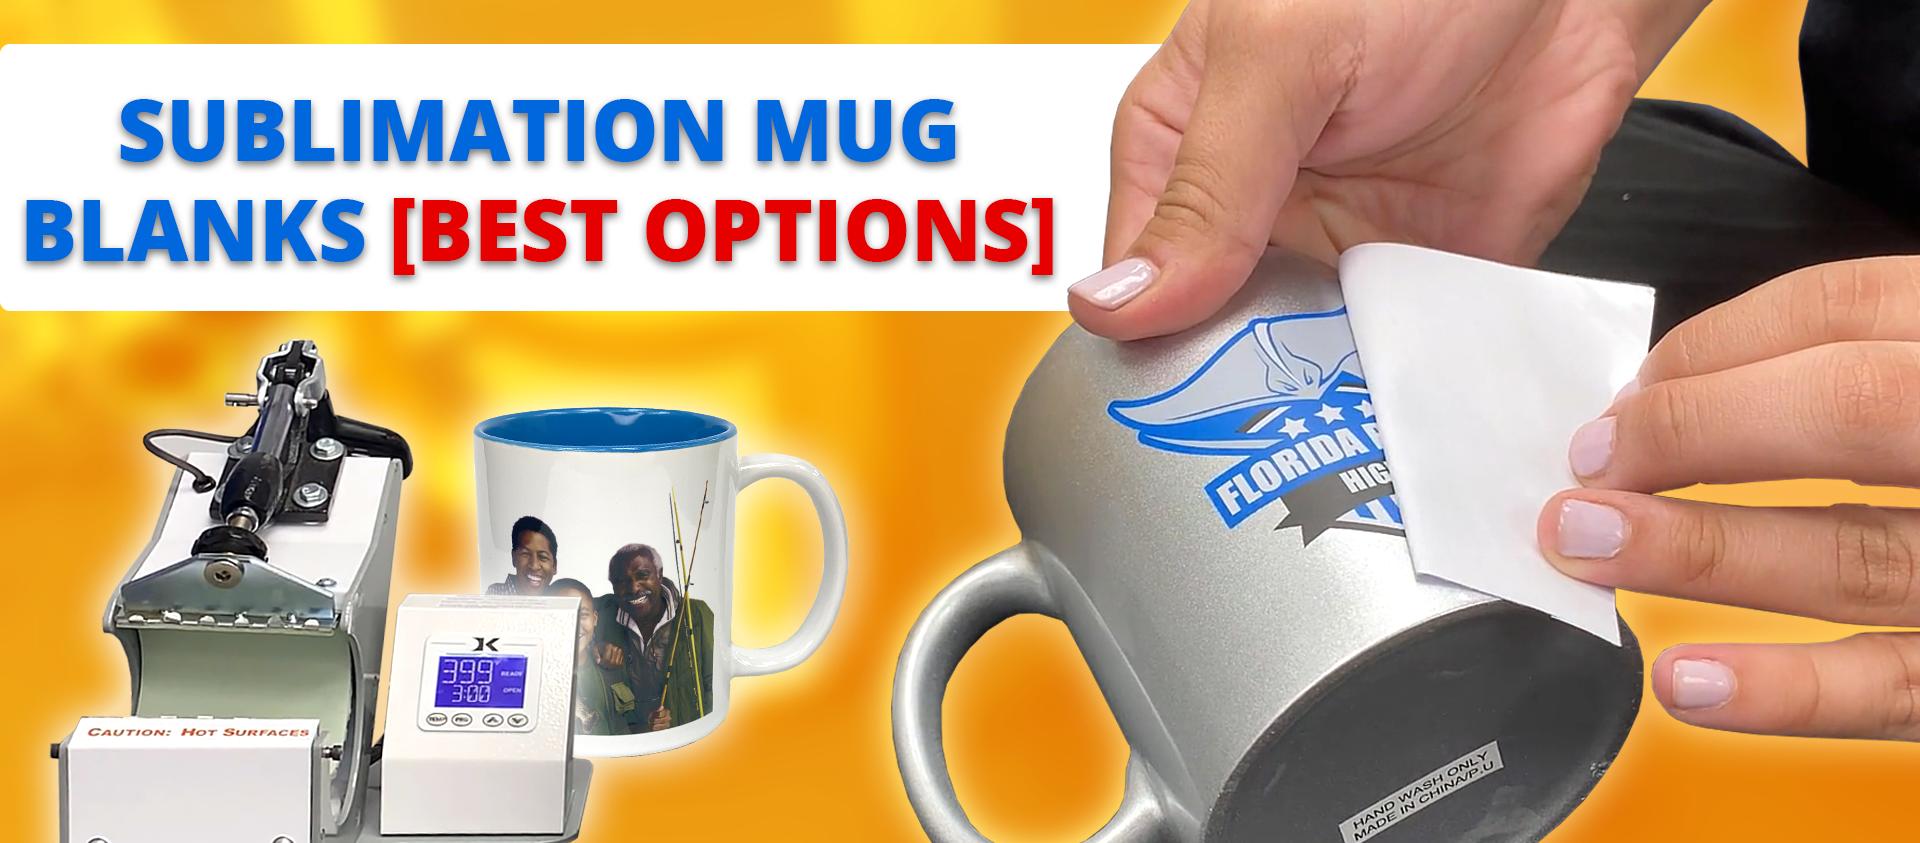 sublimation mug blanks best options